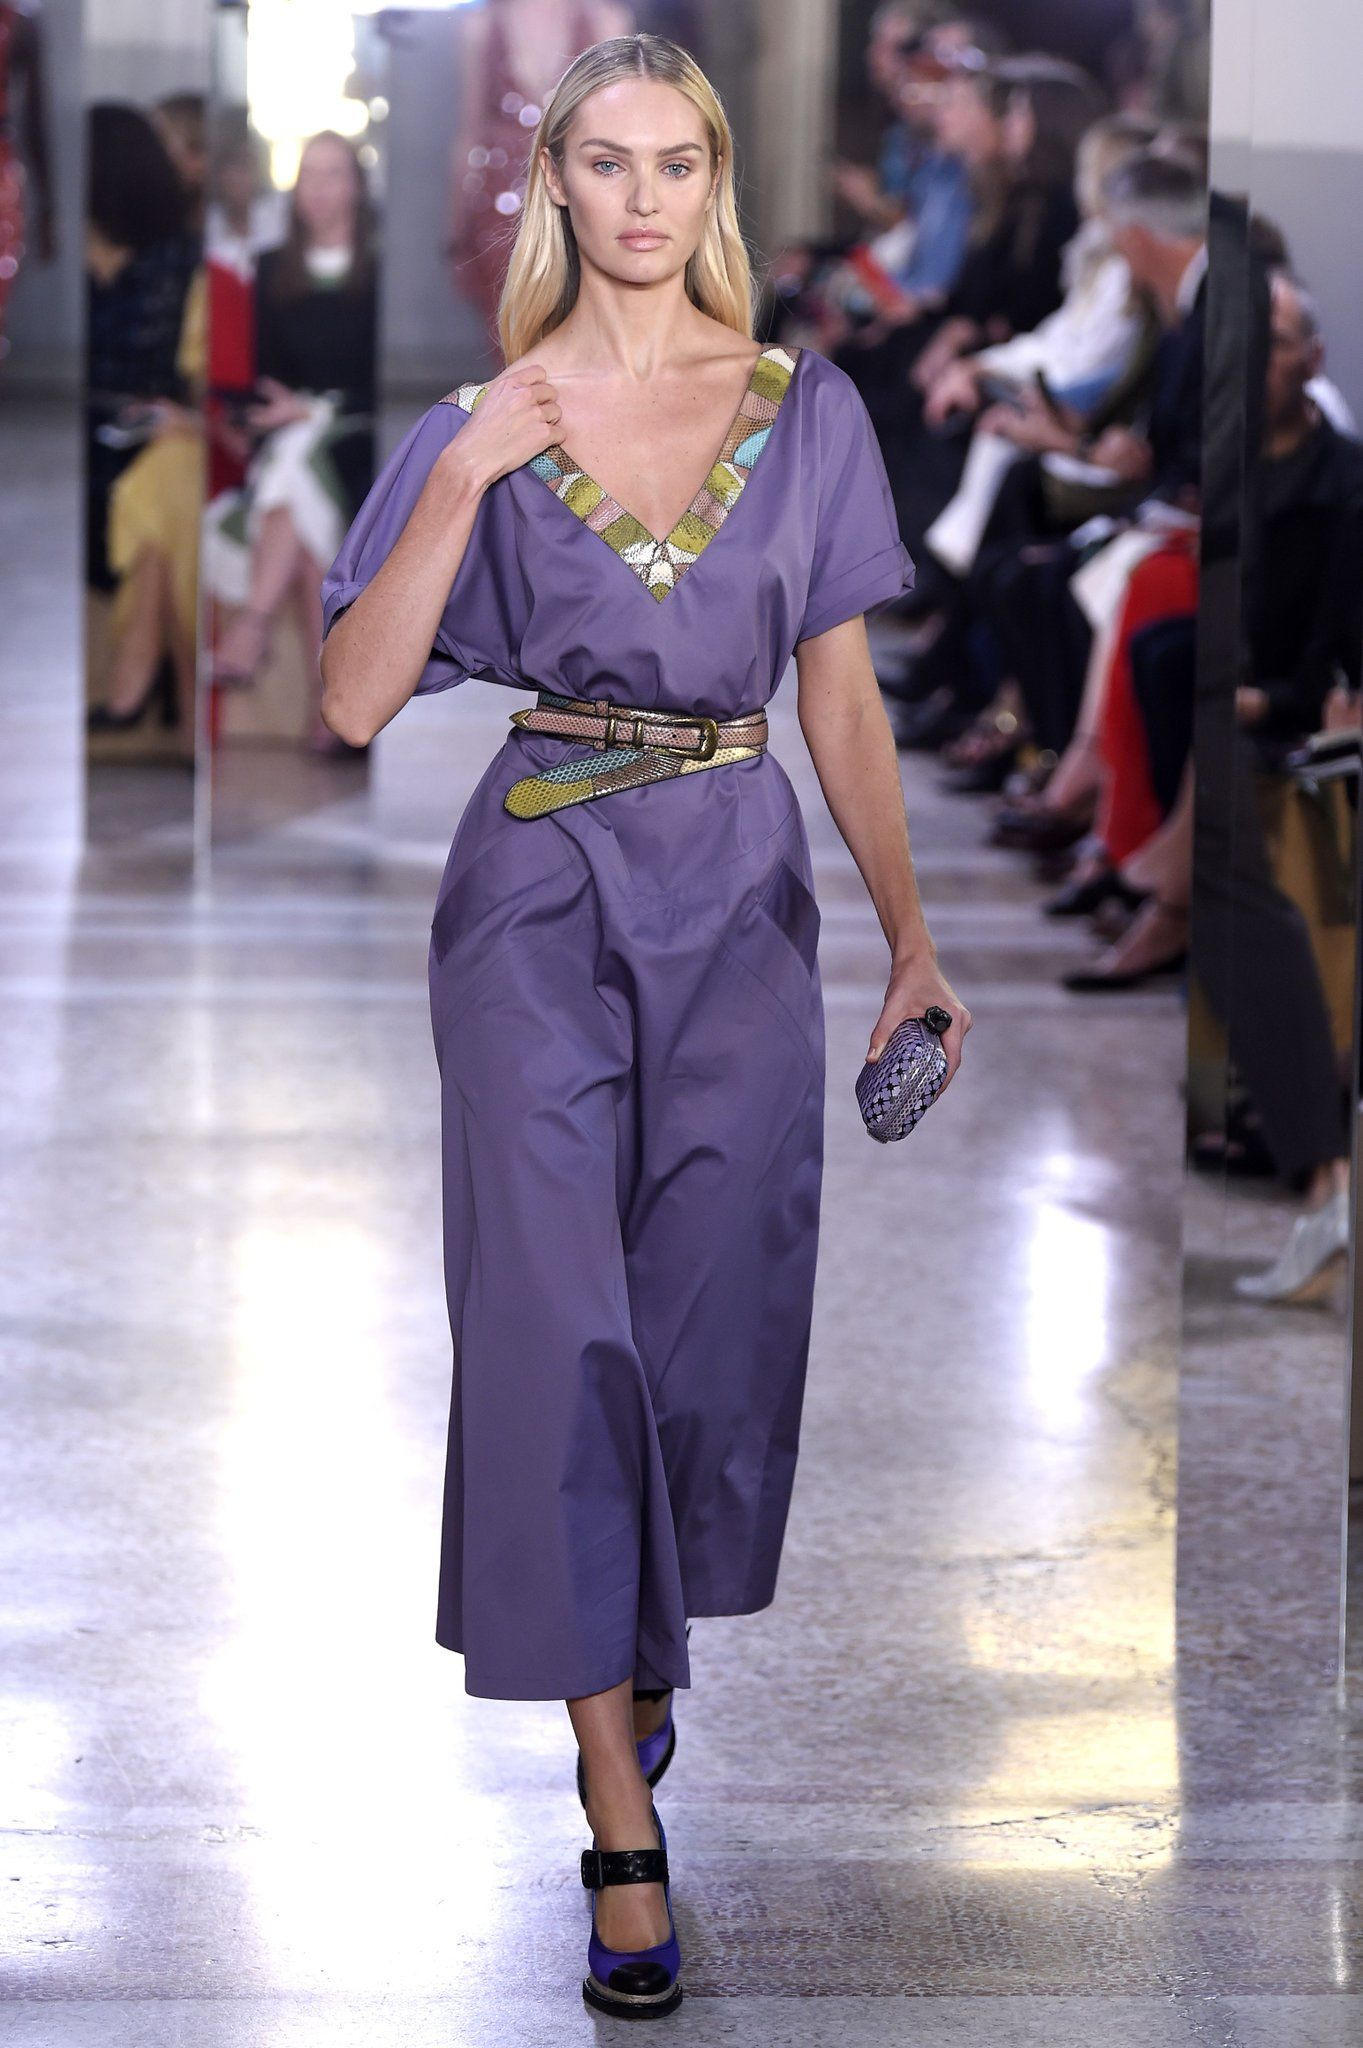 Candice swanepoel bottega veneta show in milan